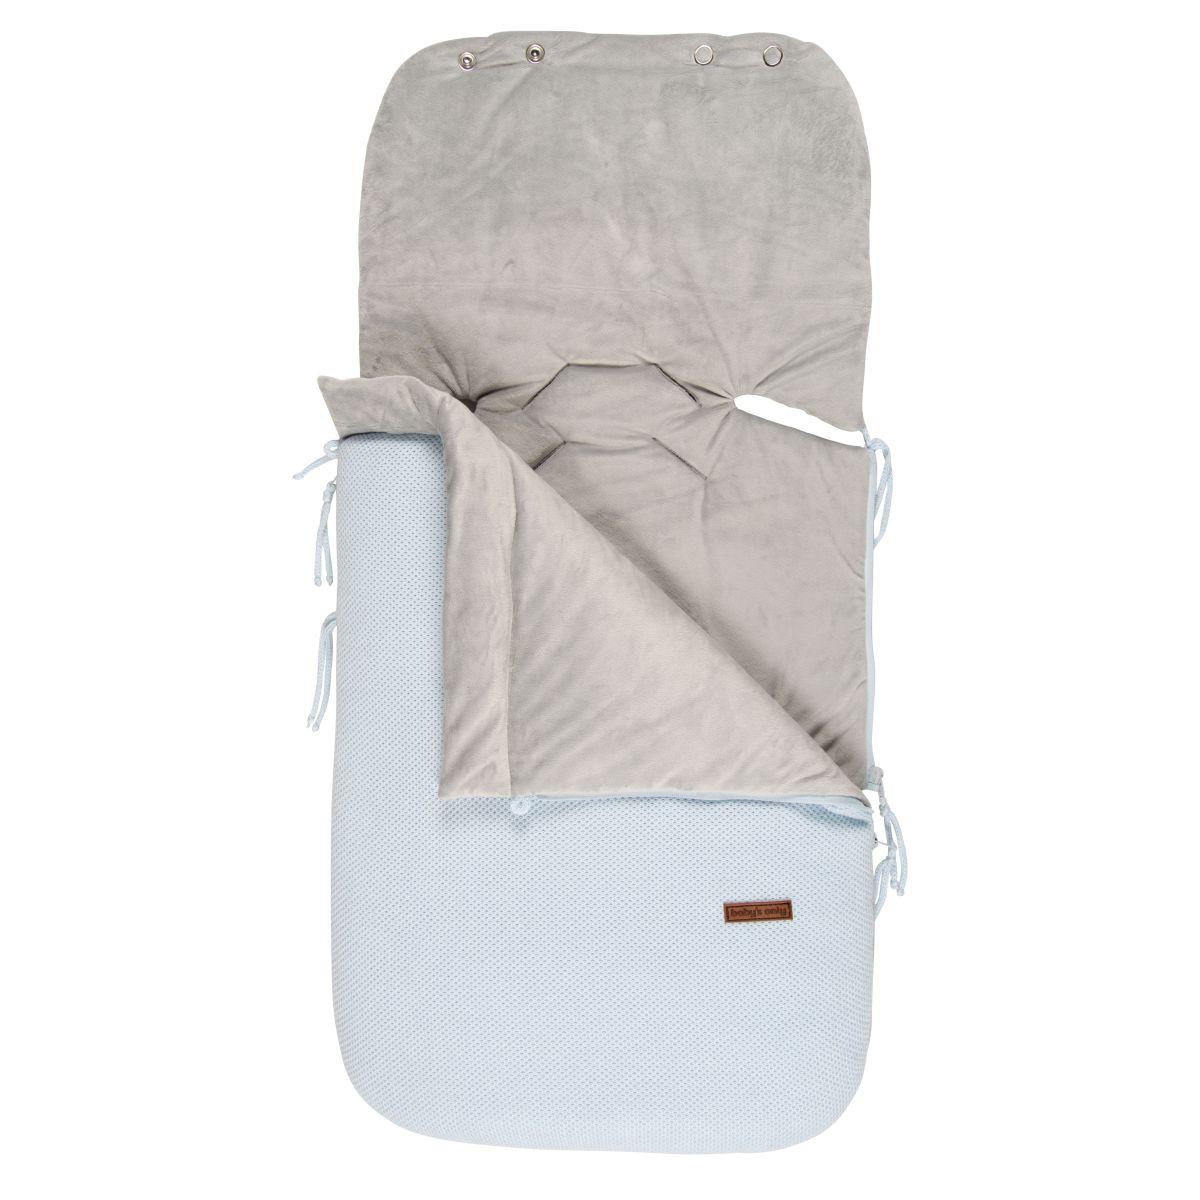 footmuff car seat 0 classic powder blue